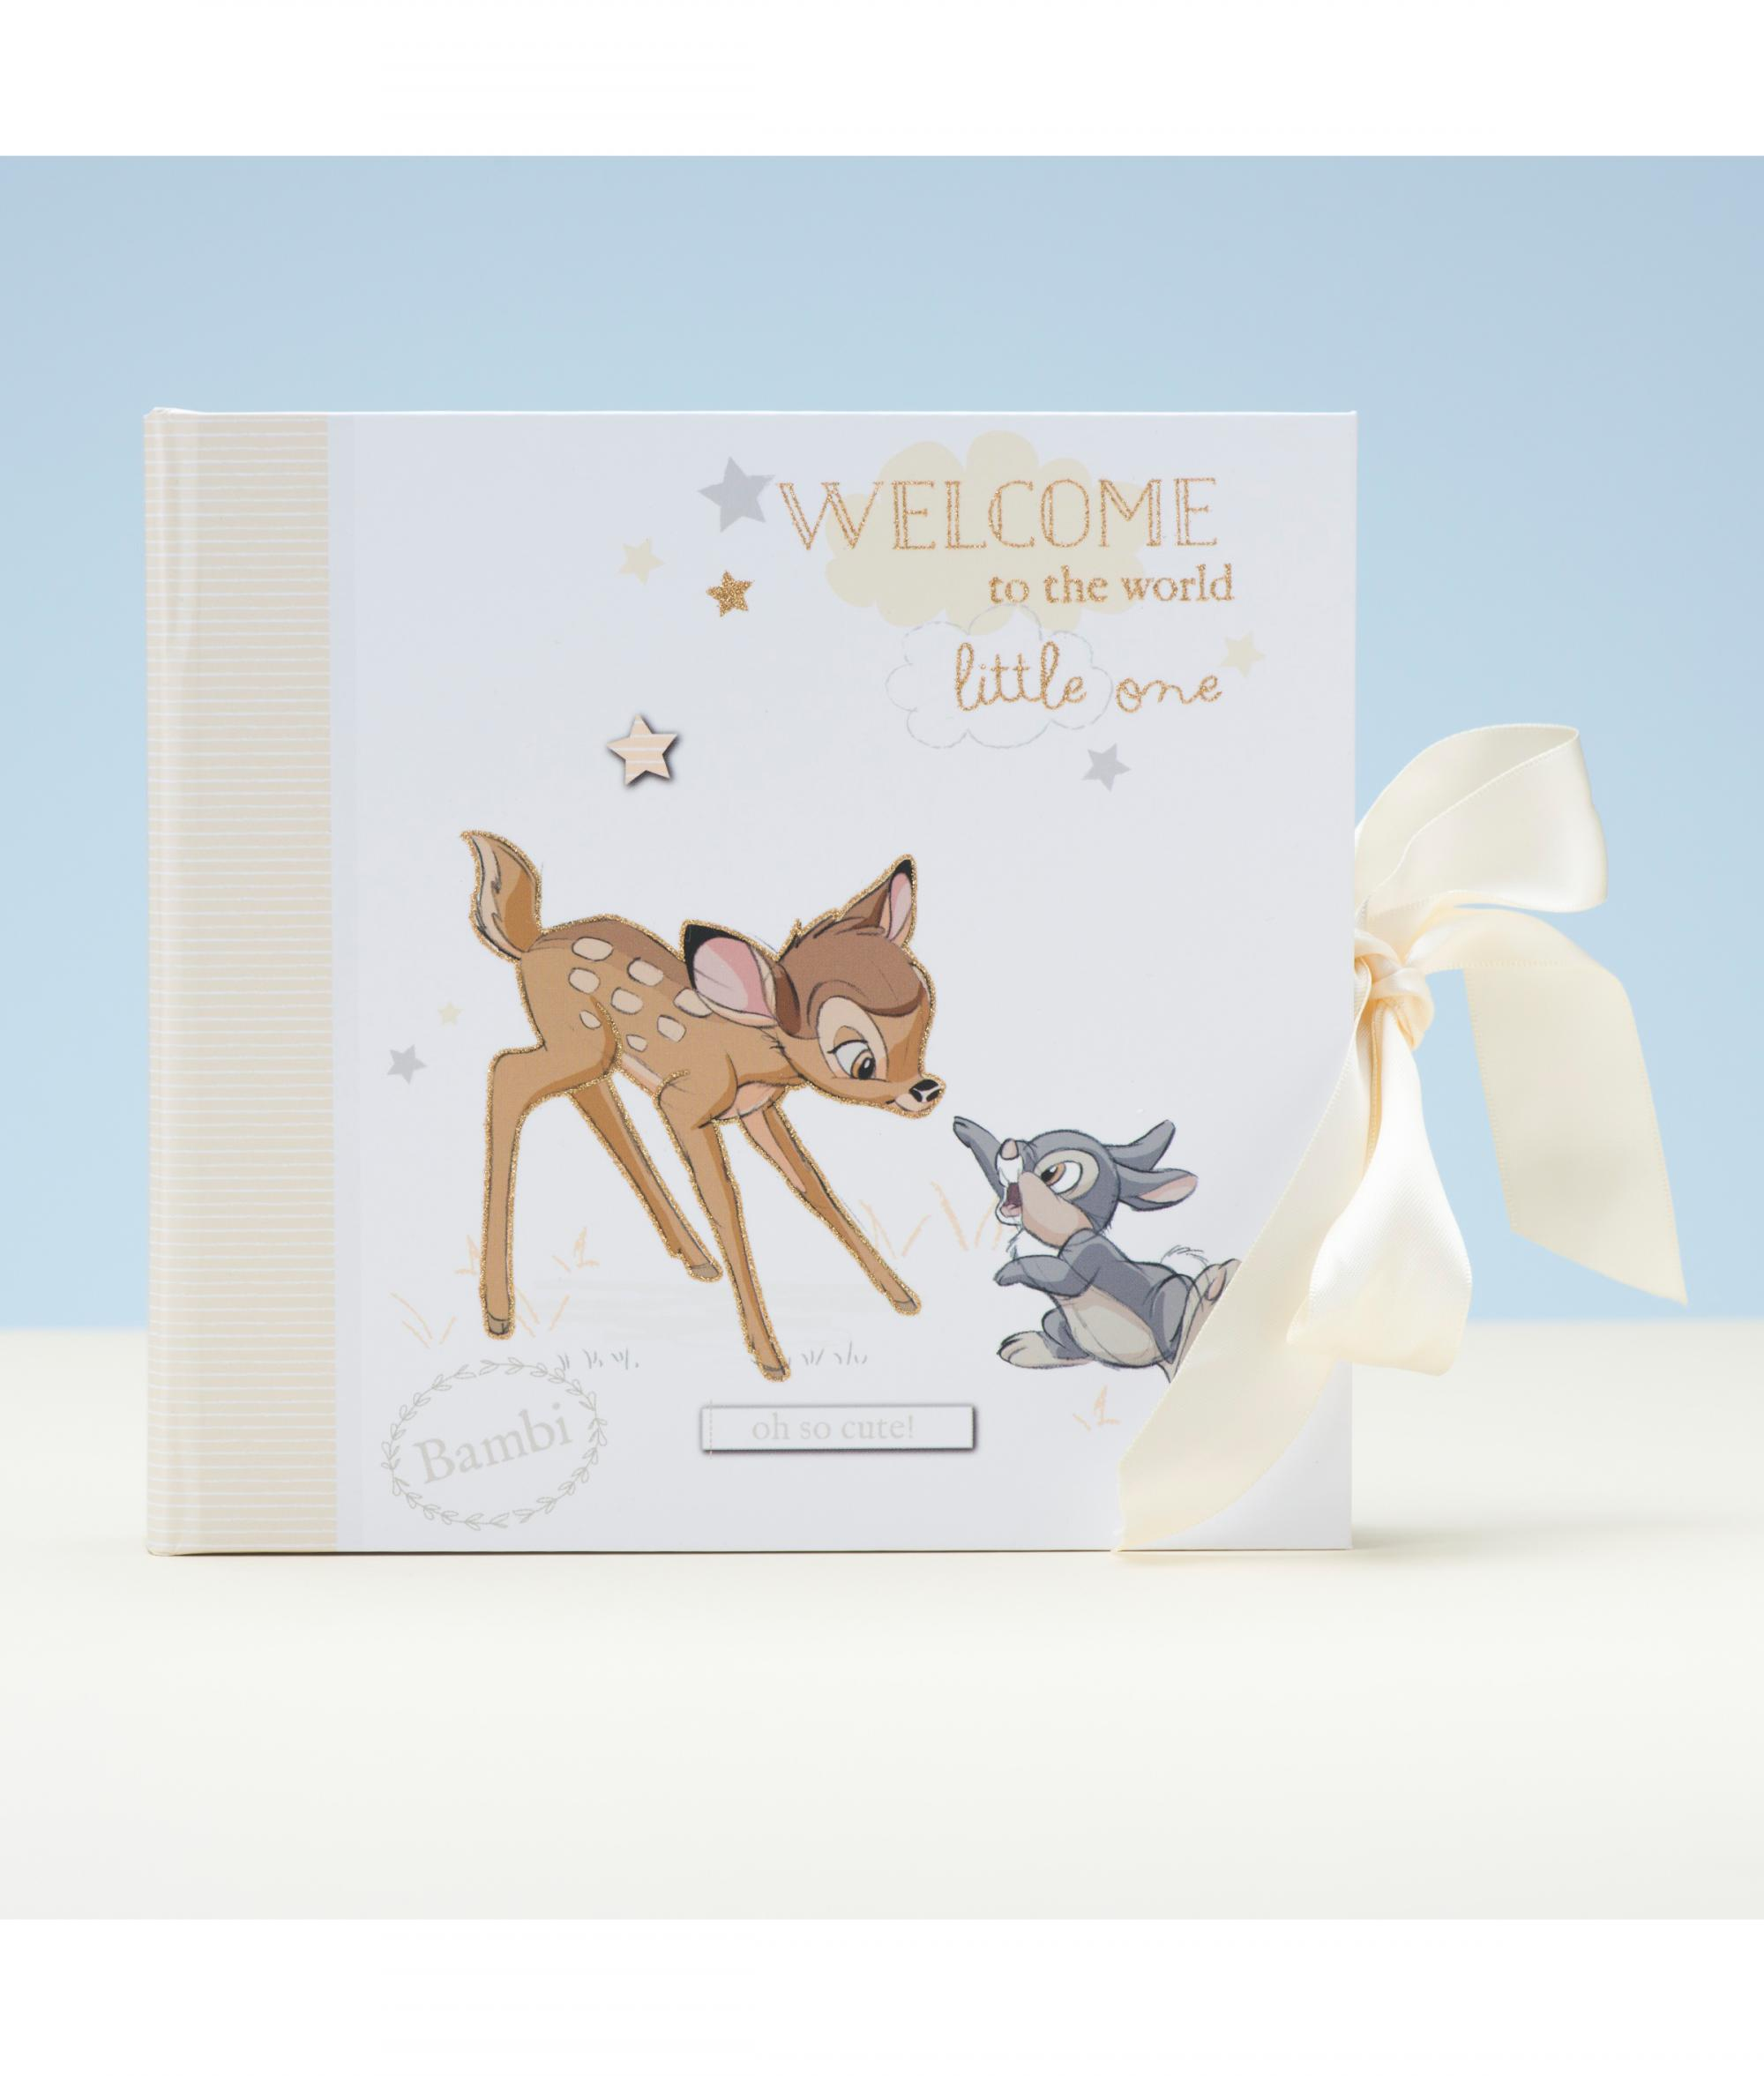 Disney Baby Gifts Uk : Disney magical beginnings bambi photo album